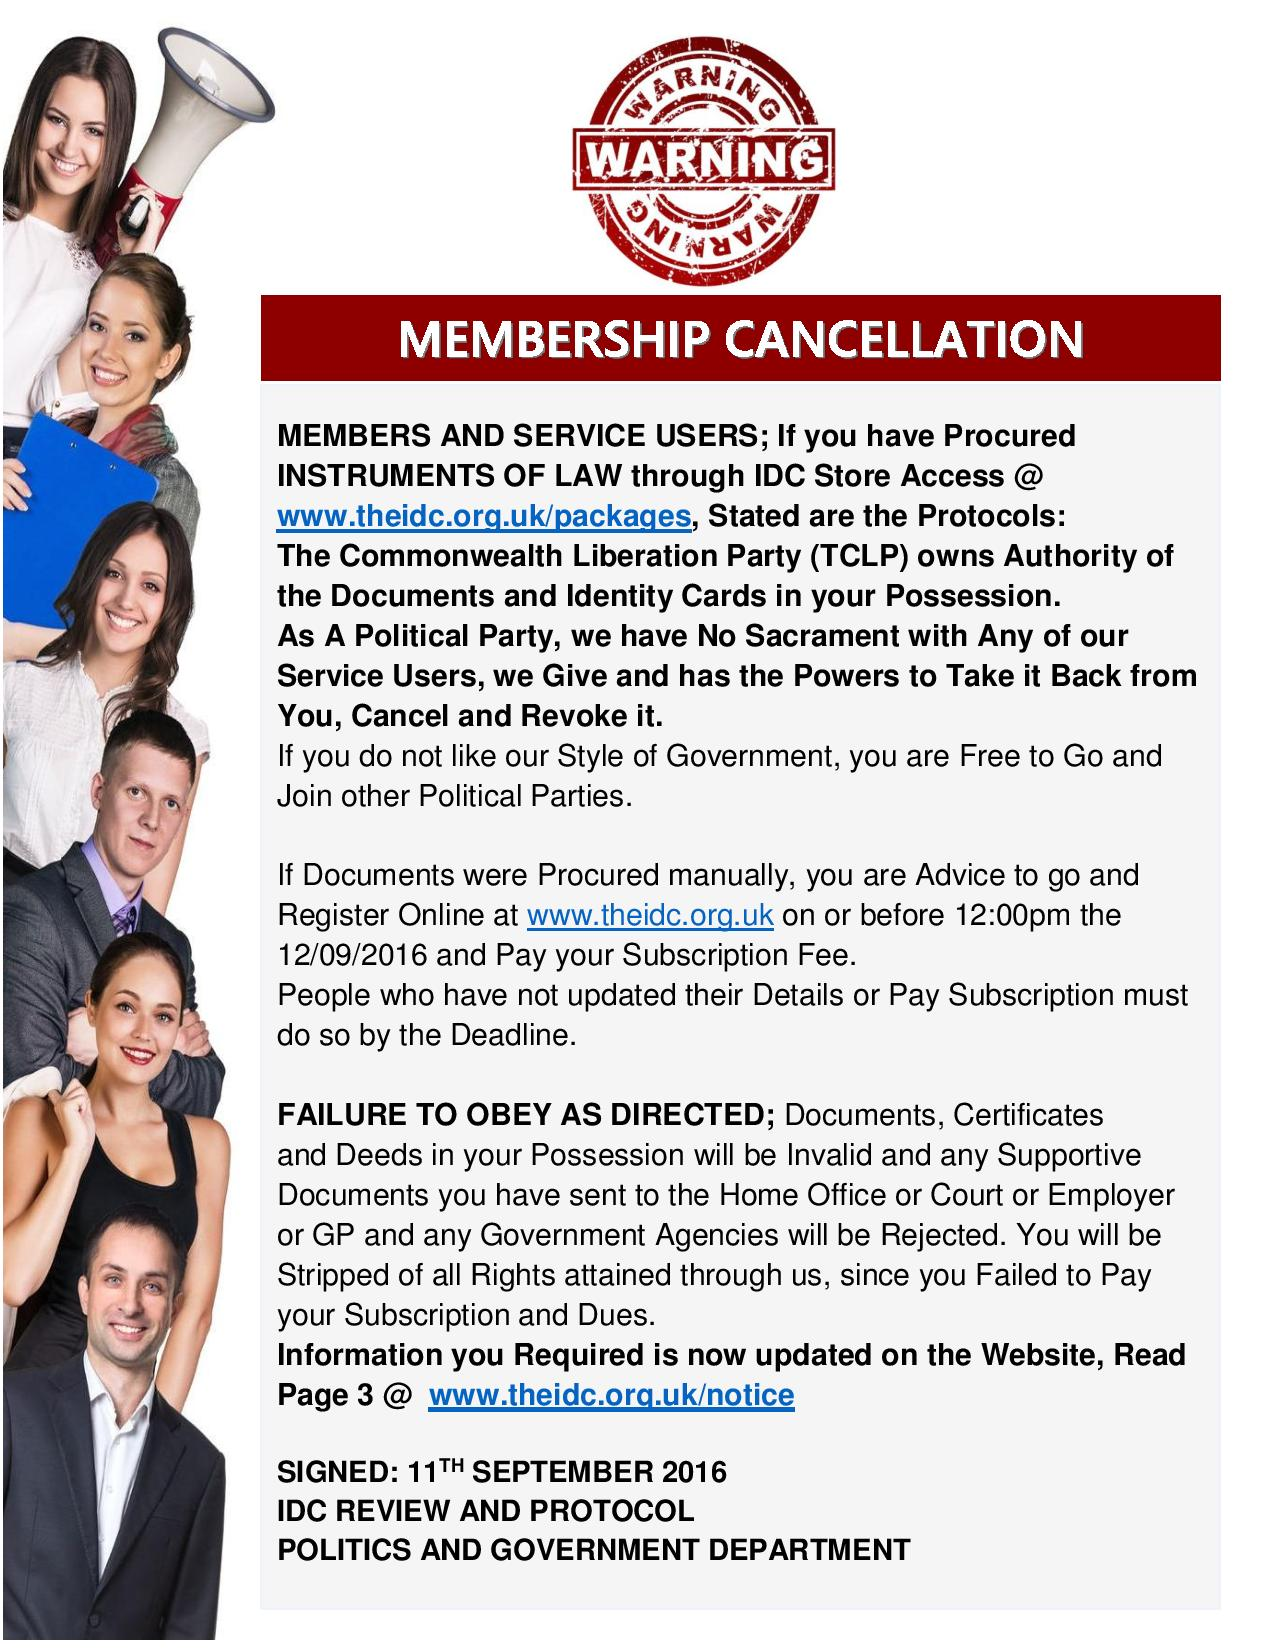 warning-membership-cancellation-11-09-2016-page-001